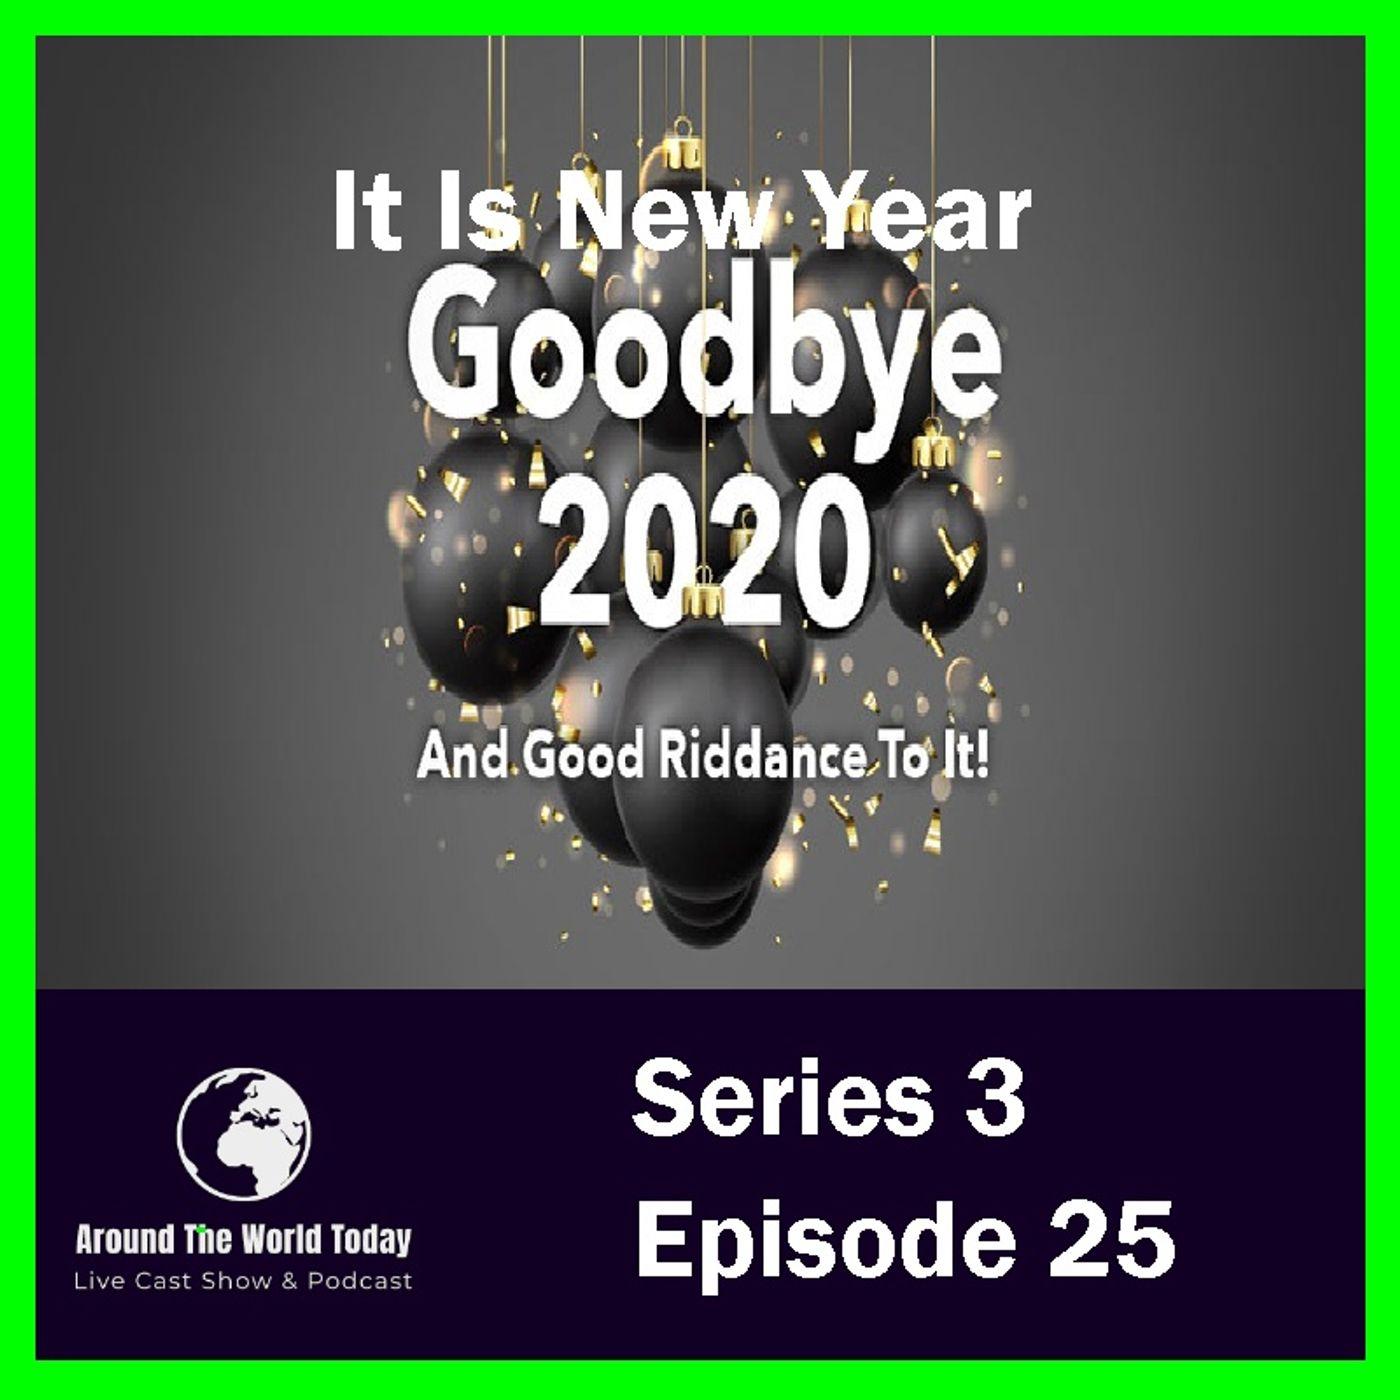 Around the World Today  Series 3 Episode 25 - Good Bye 2020